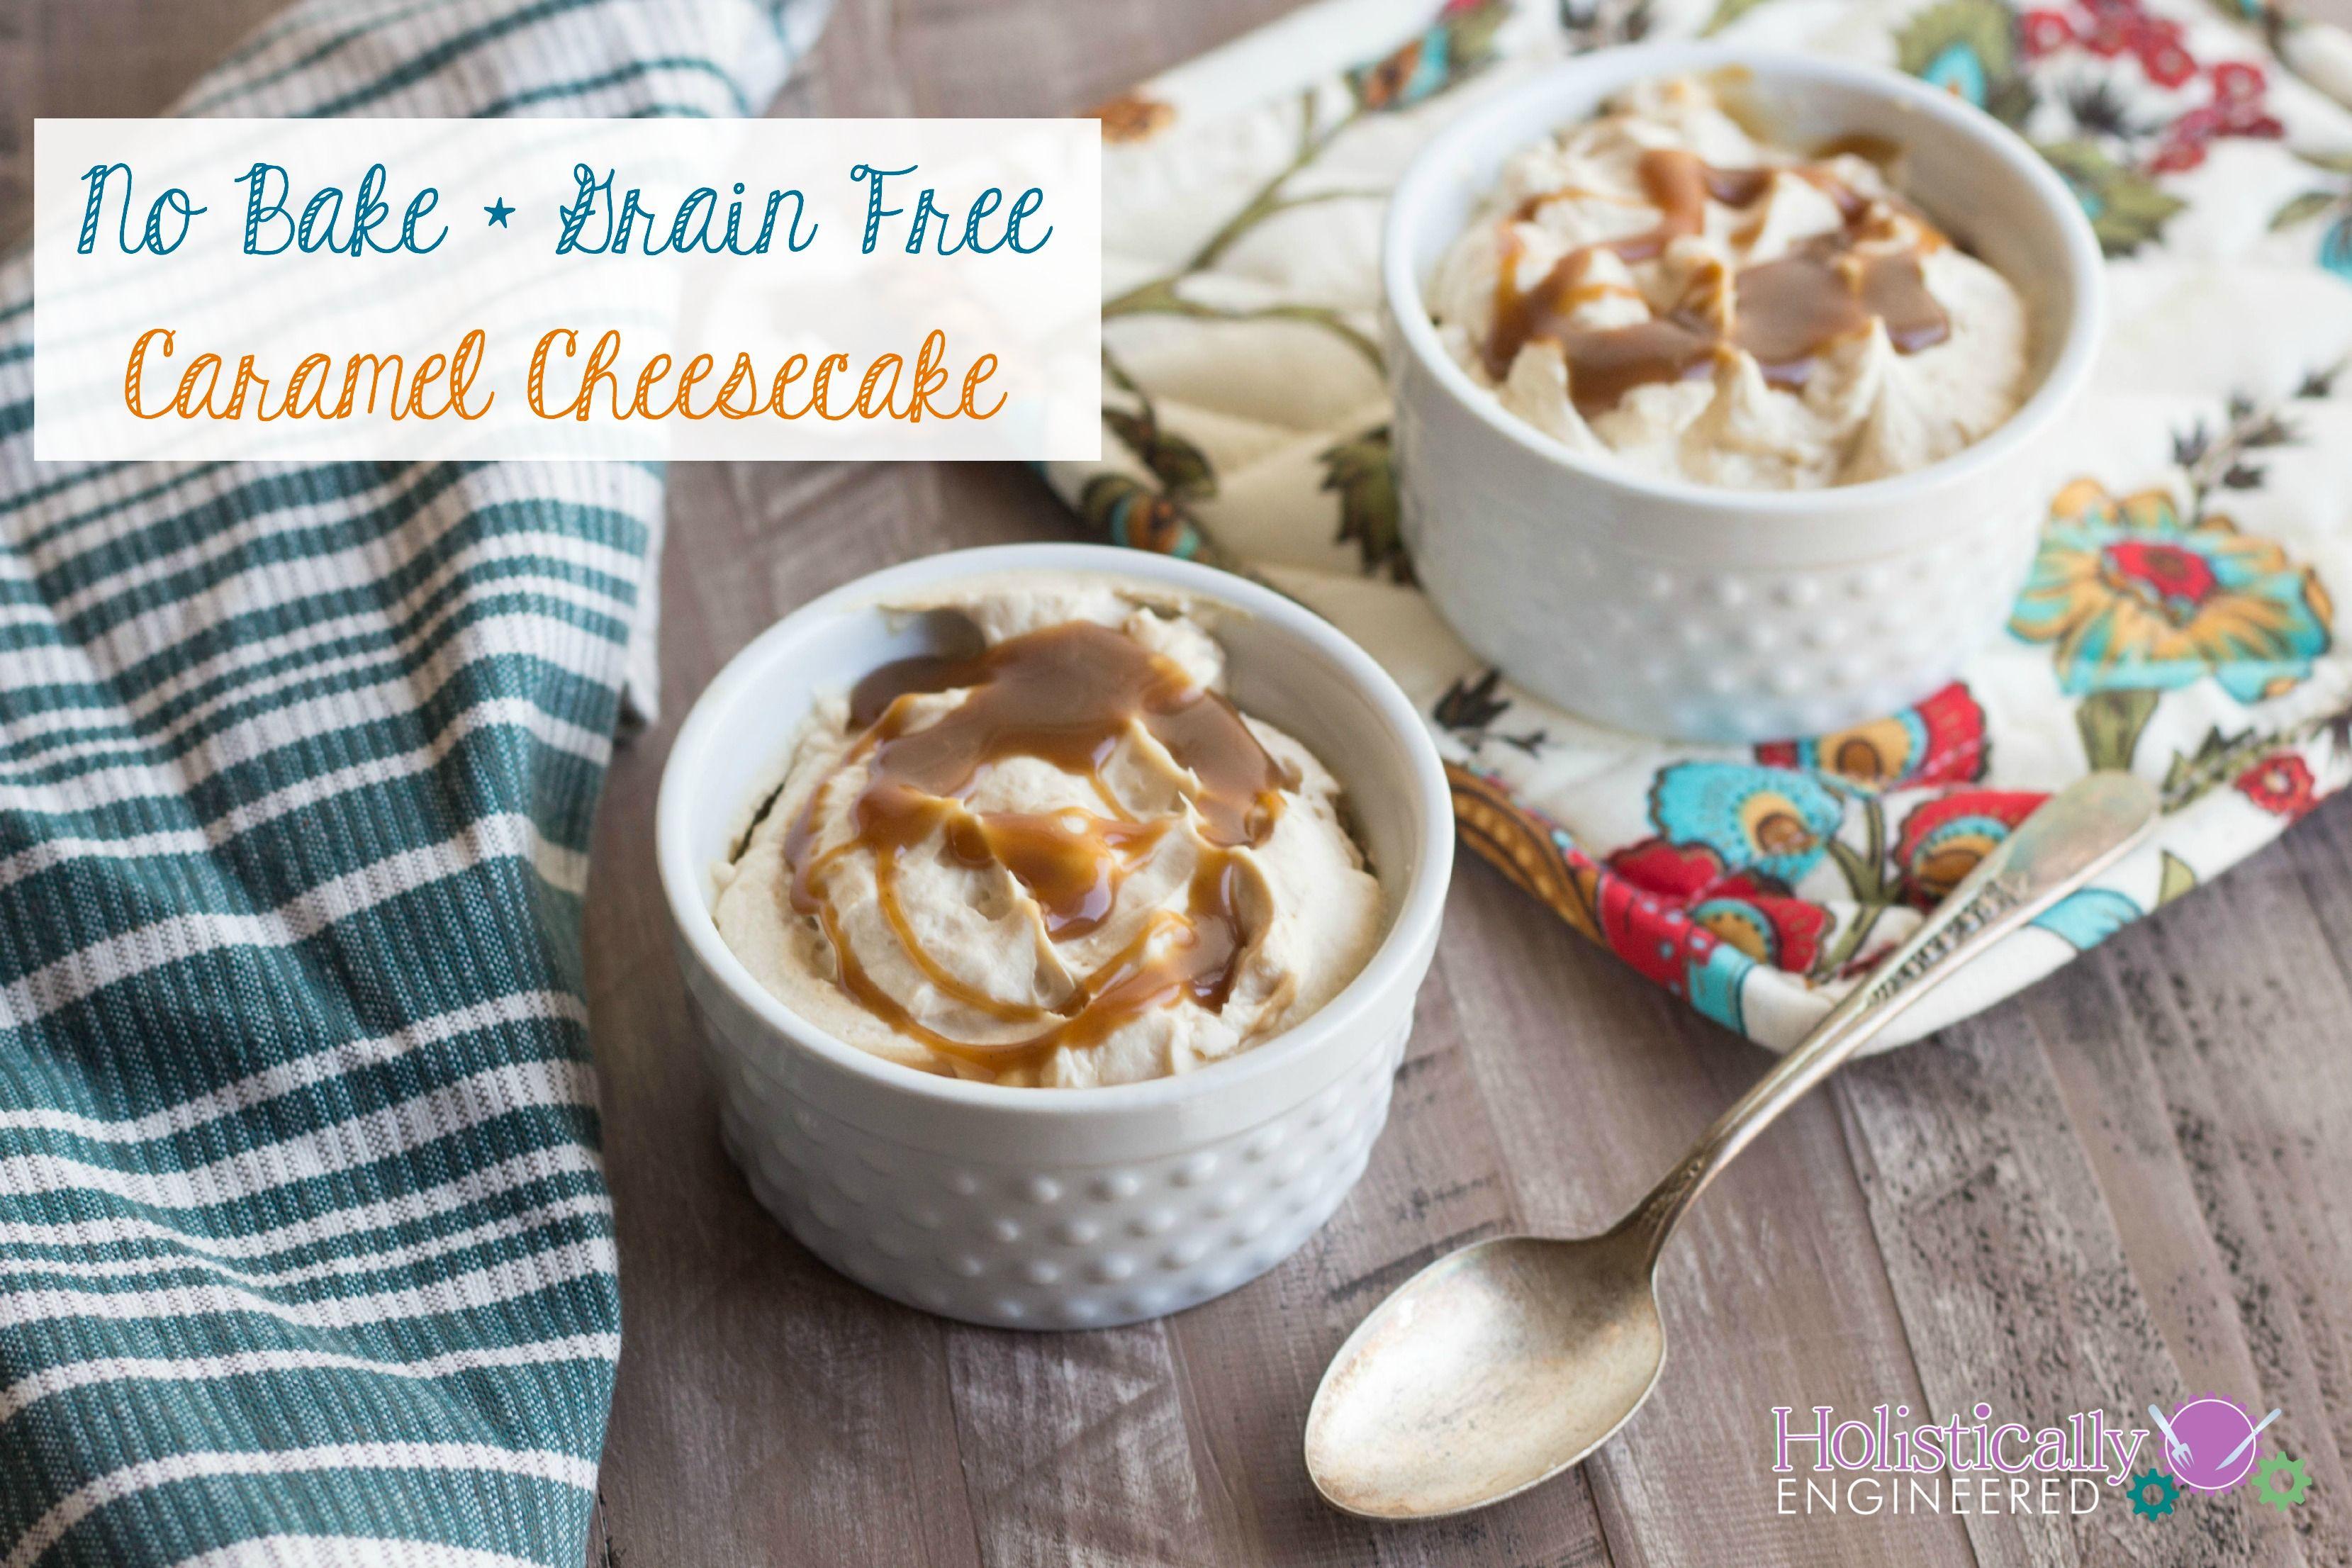 No Bake Caramel Cheesecake Grain Free Recipe No Bake Caramel